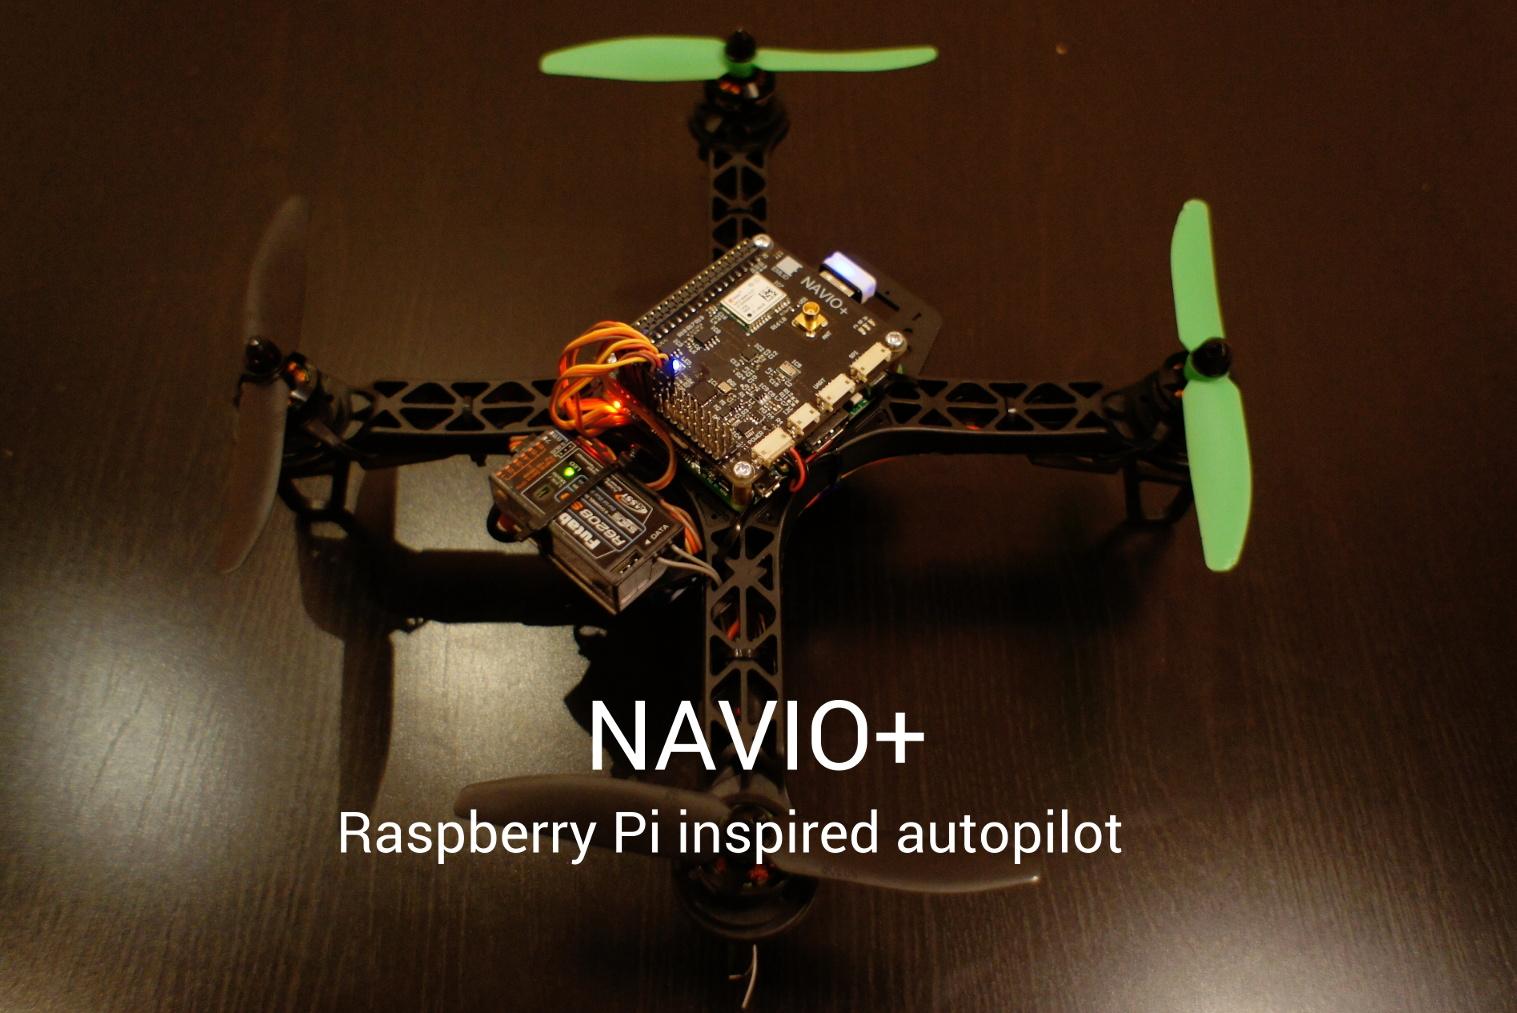 apm plane flight modes with Autopilot Drone Raspberry Pi on V22H1Y6O1mU also Rh7 D96FIK0 moreover Ardupilot Mega Apm 2 6 Autopilot furthermore JLLebY6g3J4 likewise 1.